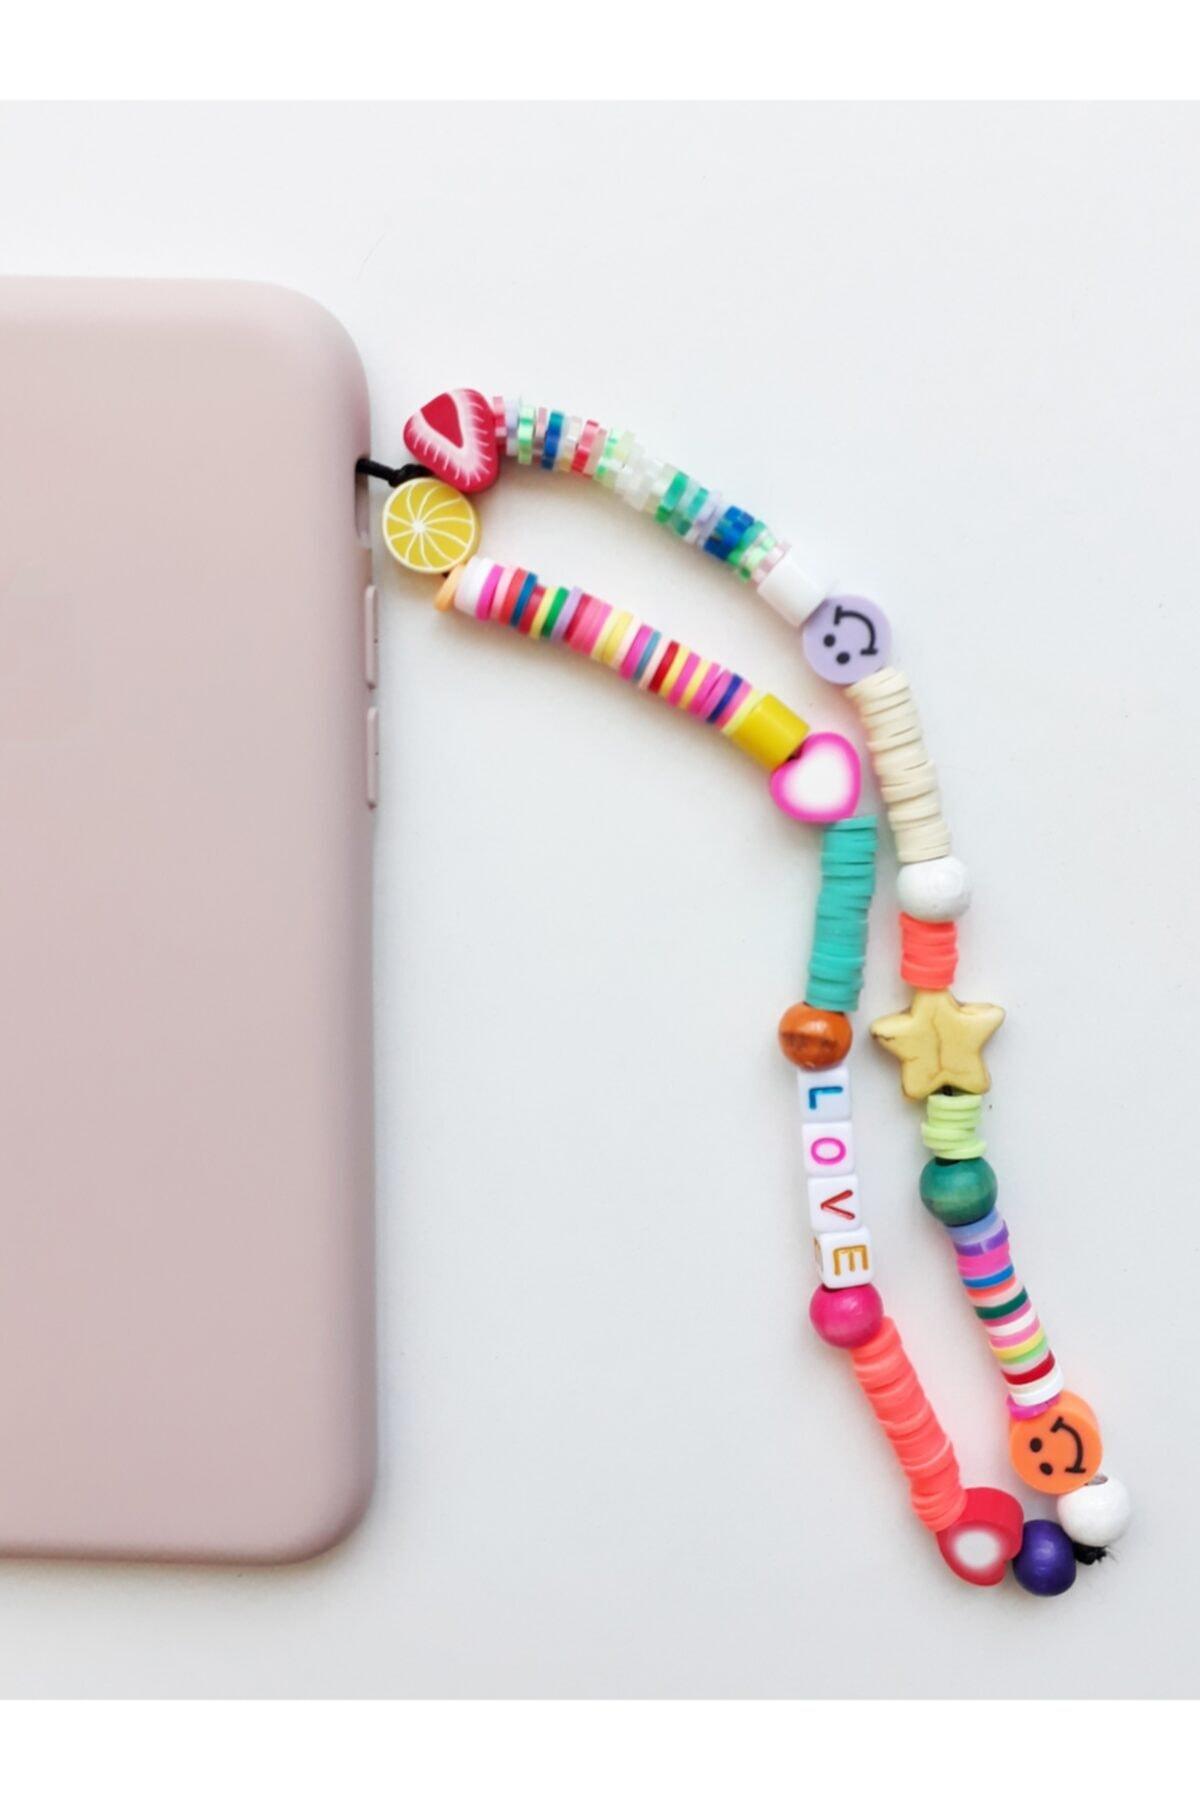 Renkli Love Desenli Telefon Charmı, Telefon Askısı Fimo